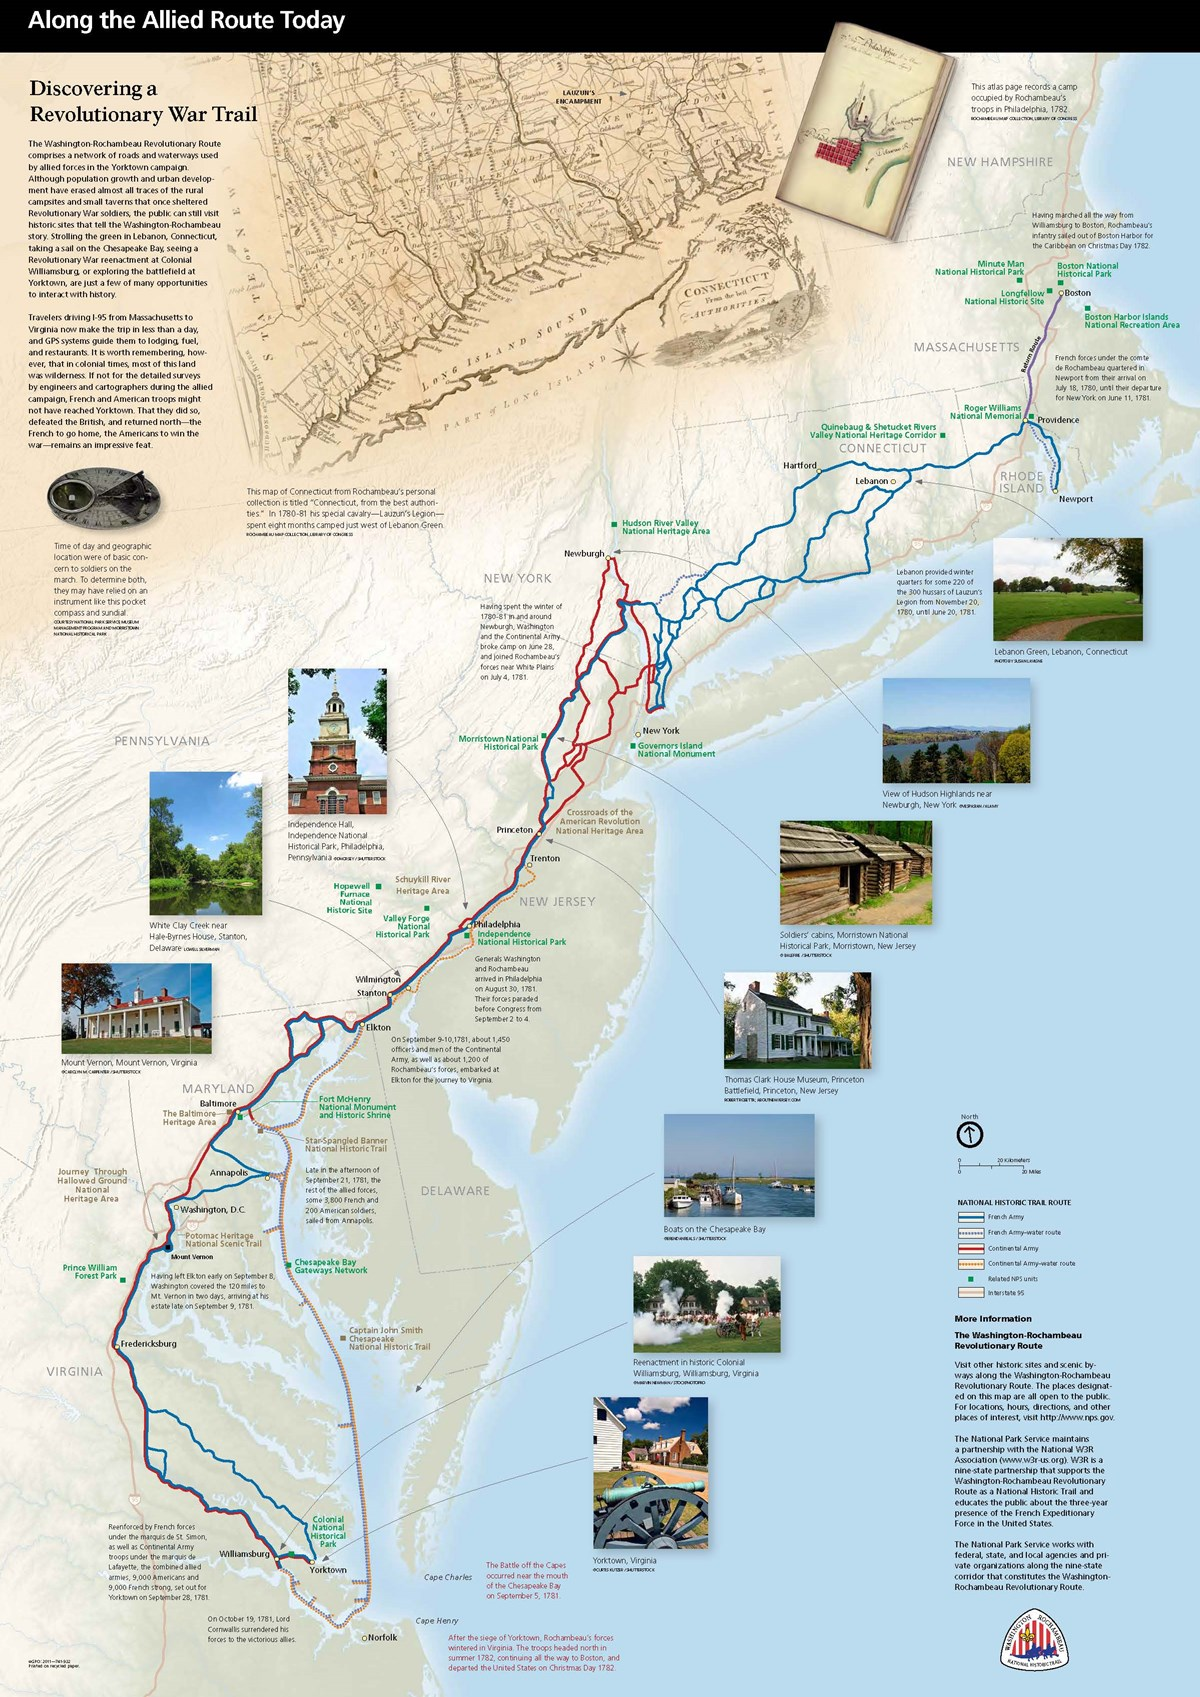 Washington-Rochambeau Revolutionary Route National Historic ... on ferguson on us map, frankfort on us map, reno on us map, cumberland on us map, st. augustine on us map, pittsburgh on us map, plano on us map, pasadena on us map, oakland on us map, greensboro on us map, juneau on us map, columbia on us map, pierre on us map, roanoke on us map, american samoa on us map, harrisburg on us map, jackson on us map, aberdeen on us map, durham on us map, fredericksburg on us map,